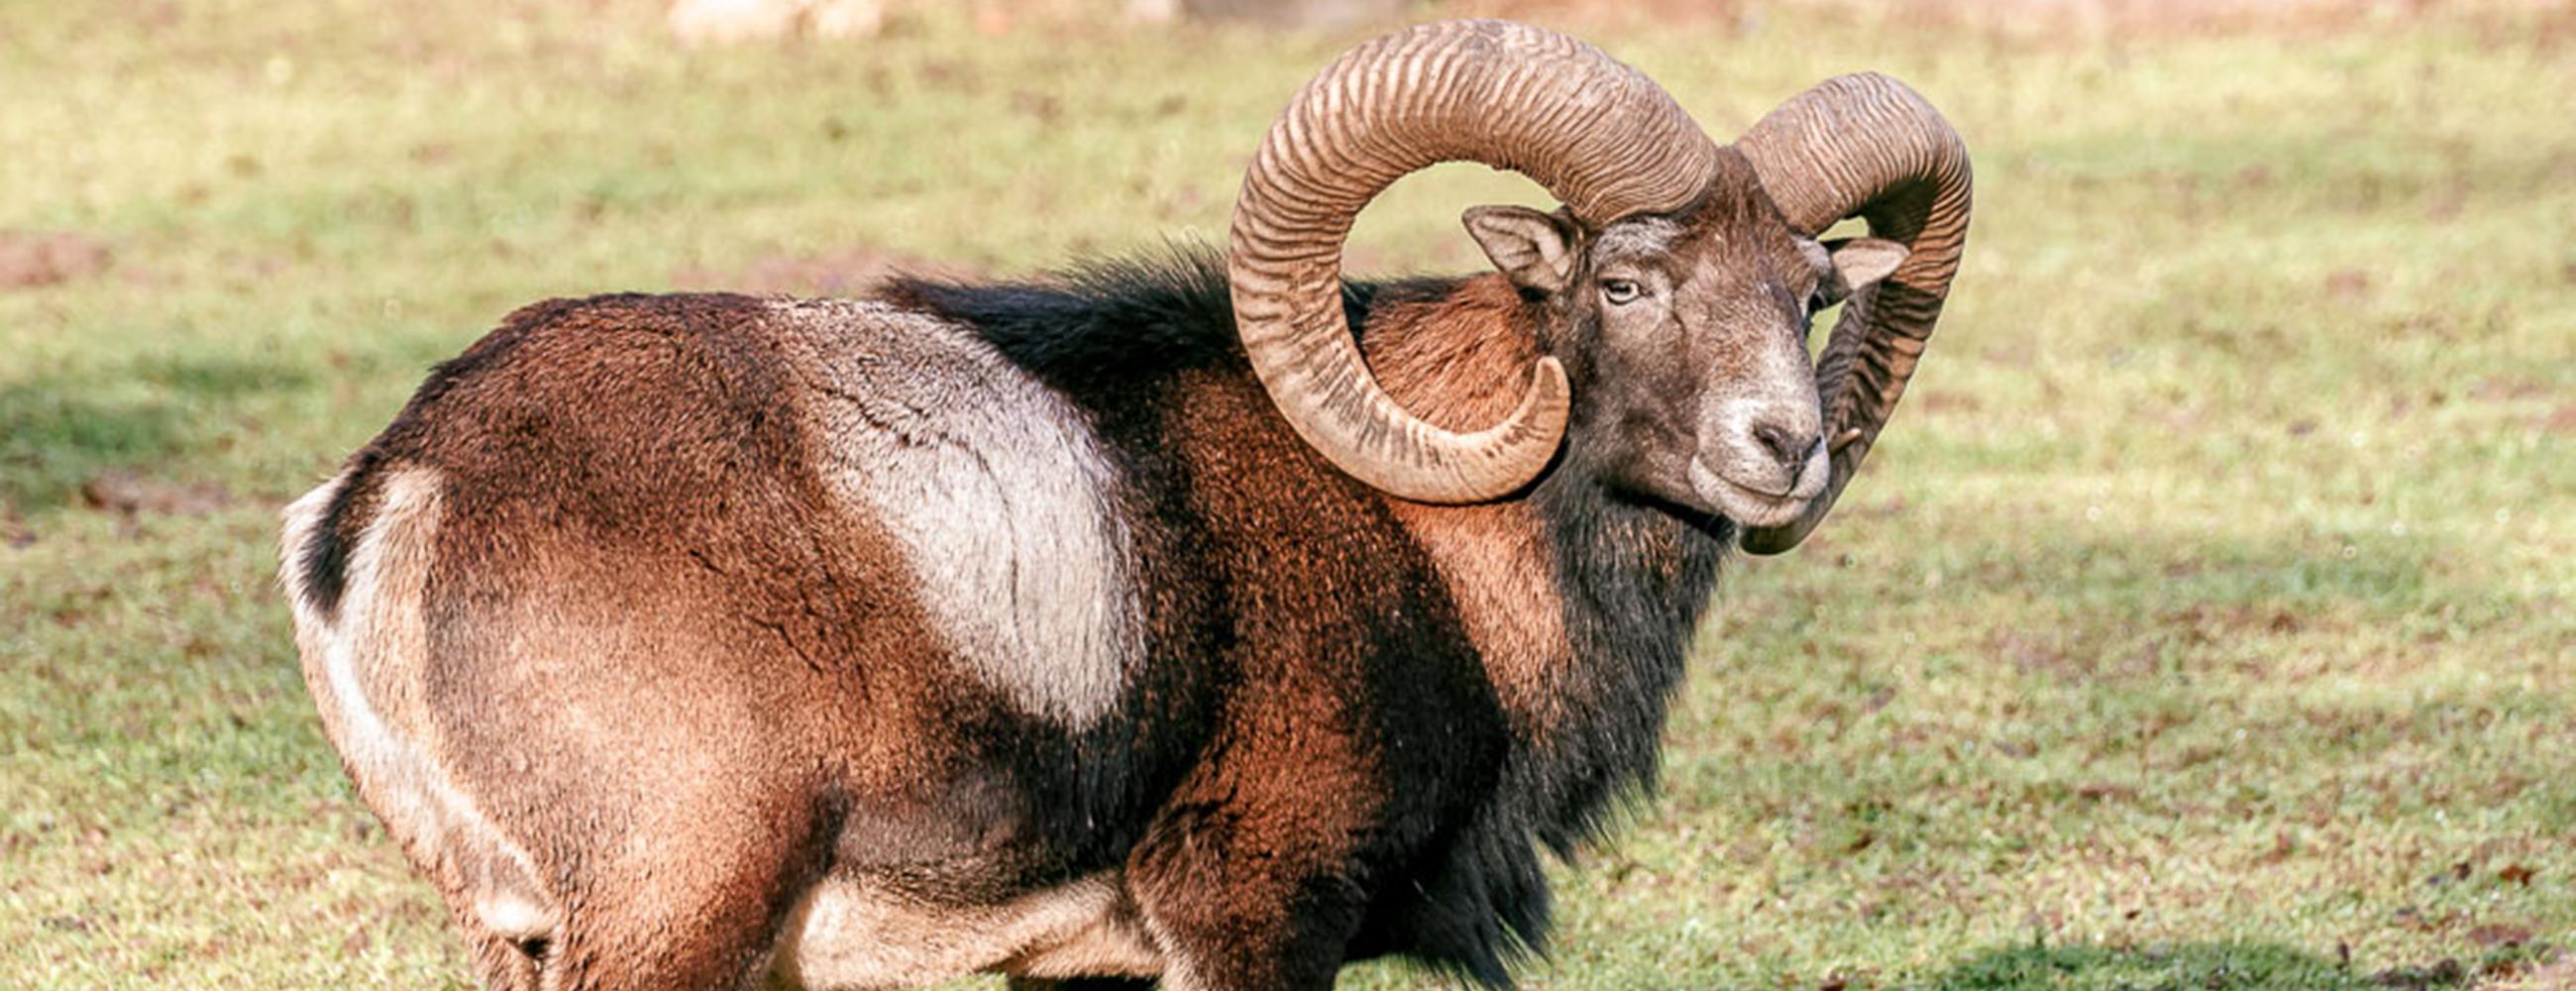 Mufflon im Wildpark